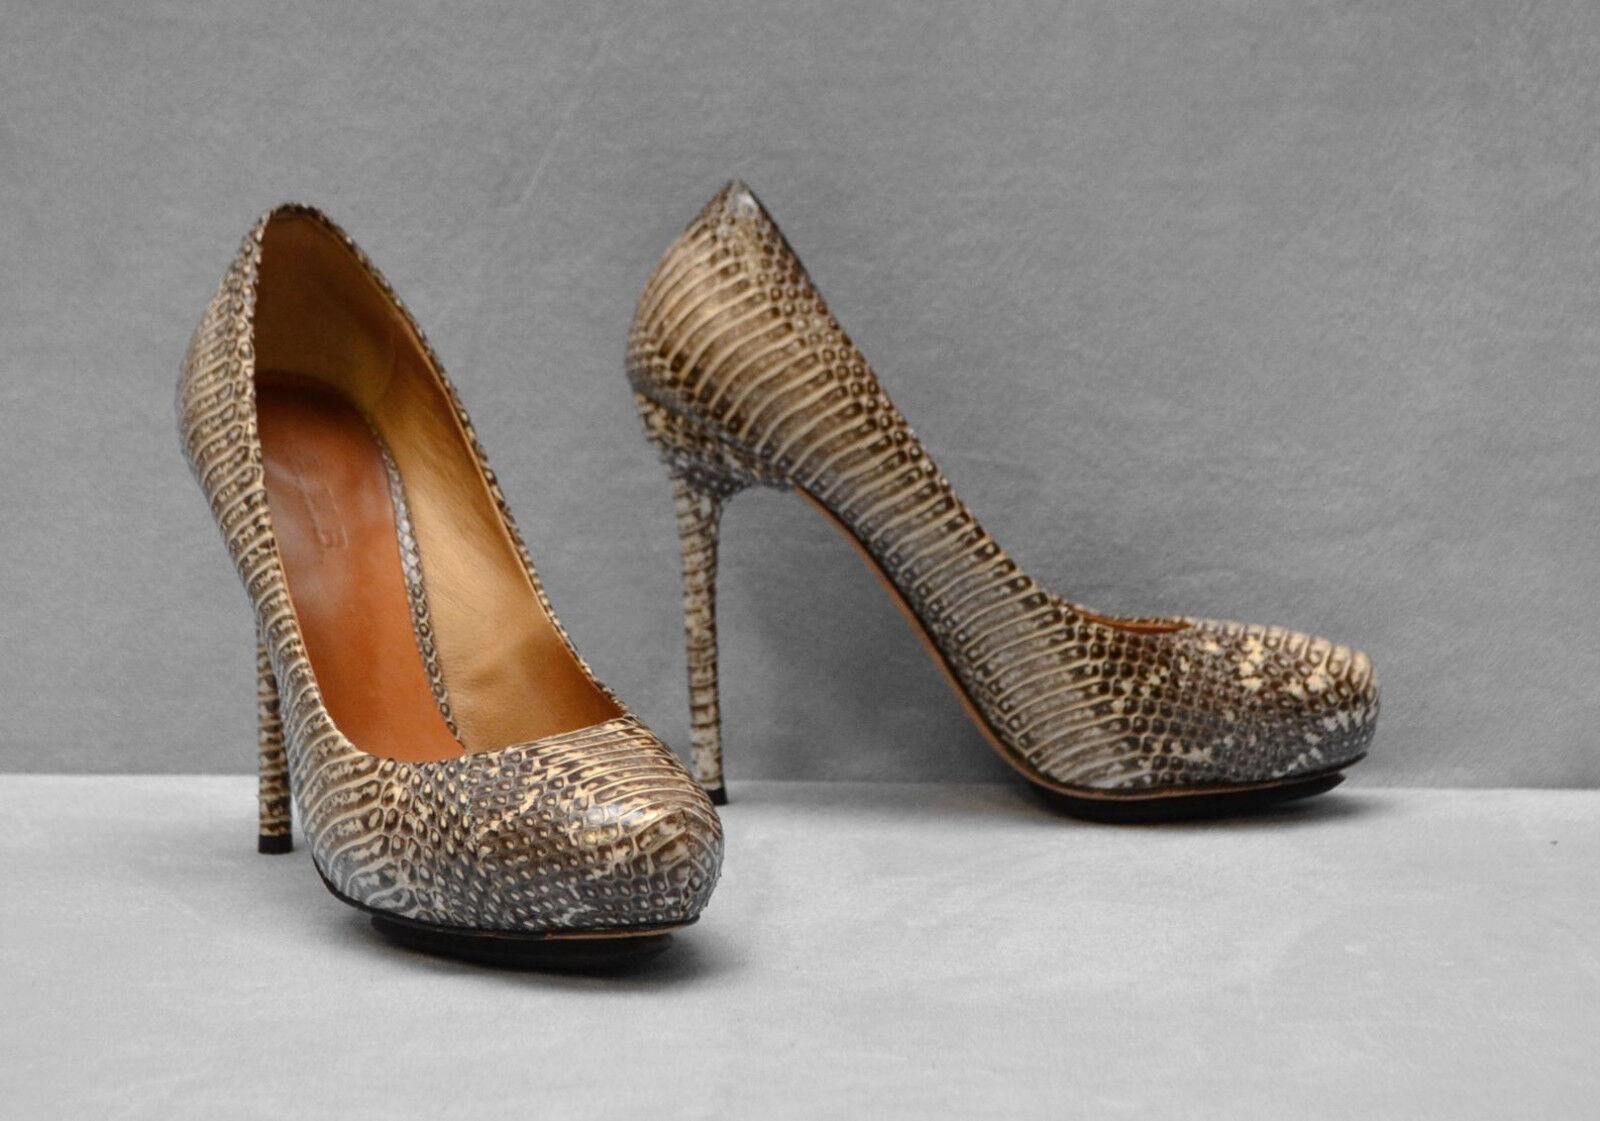 C0 L. A. M. B. Python Embossed Leather Hidden Platform Pump Heels chaussures Sz 6.5 M